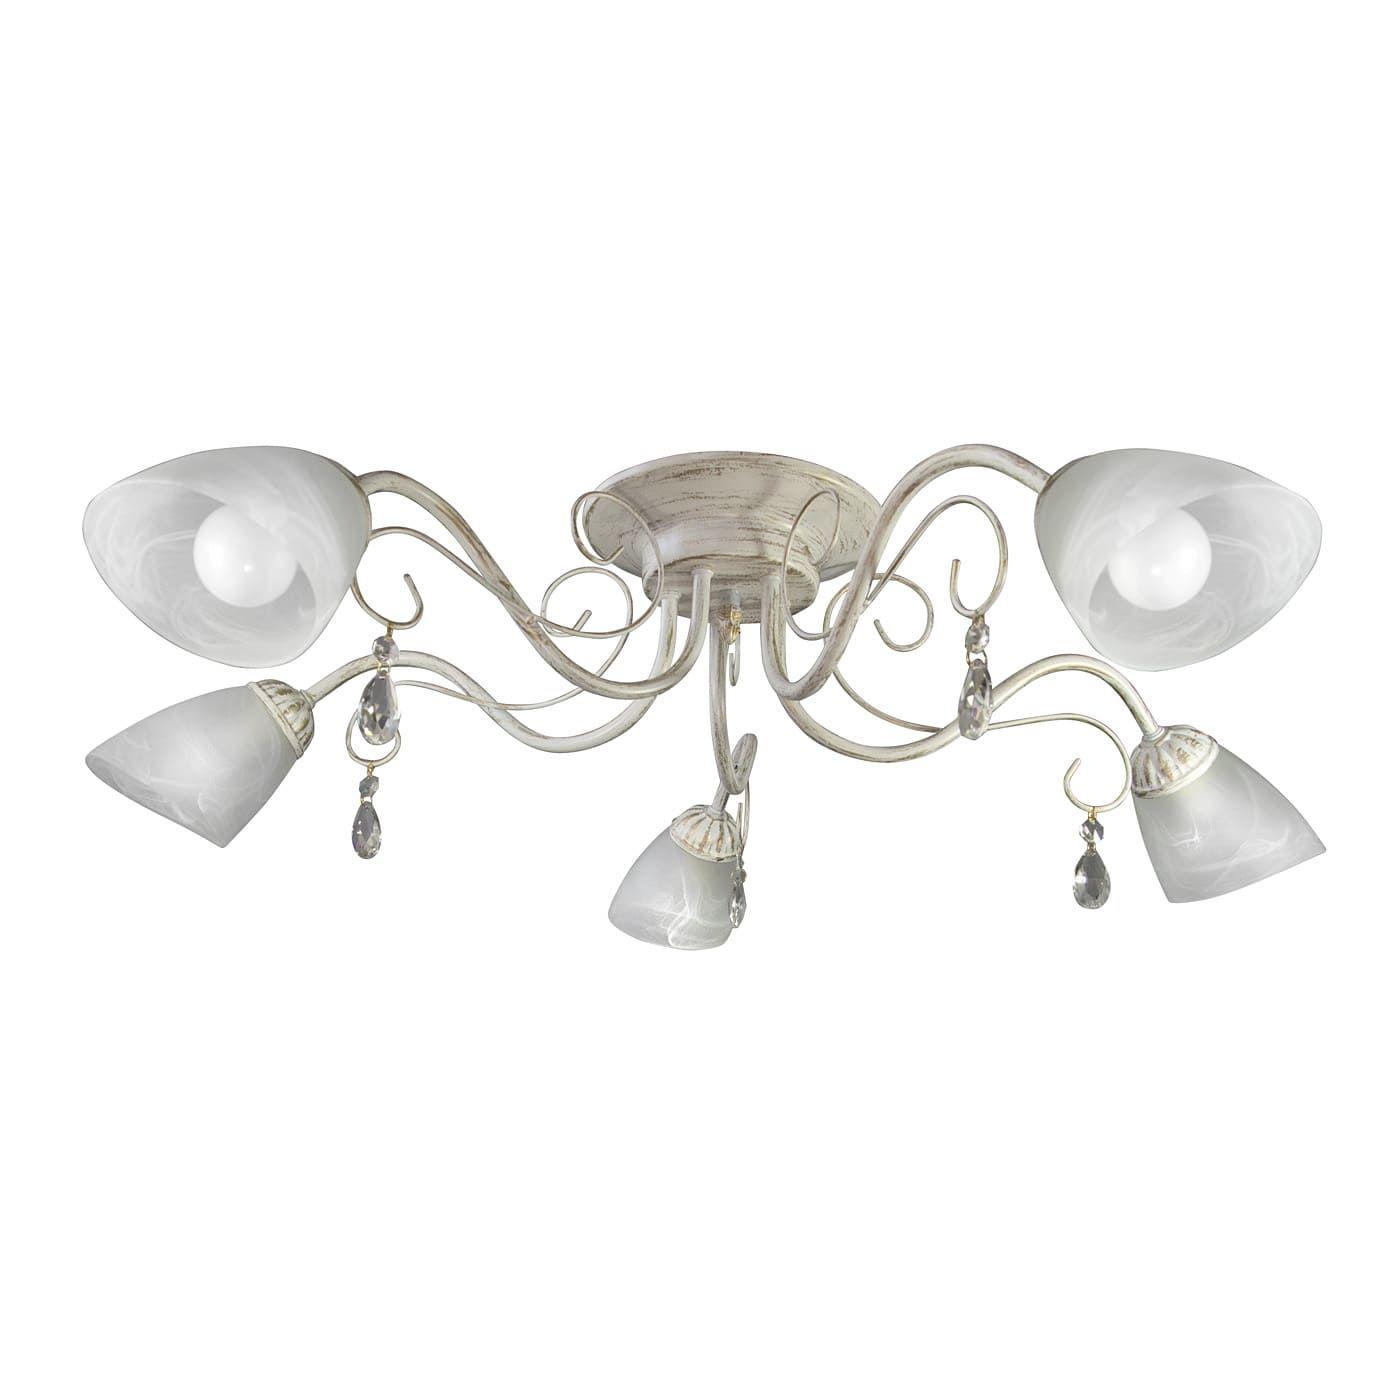 PETRASVET / Ceiling chandelier S2111-5, 5xE14 max. 60W